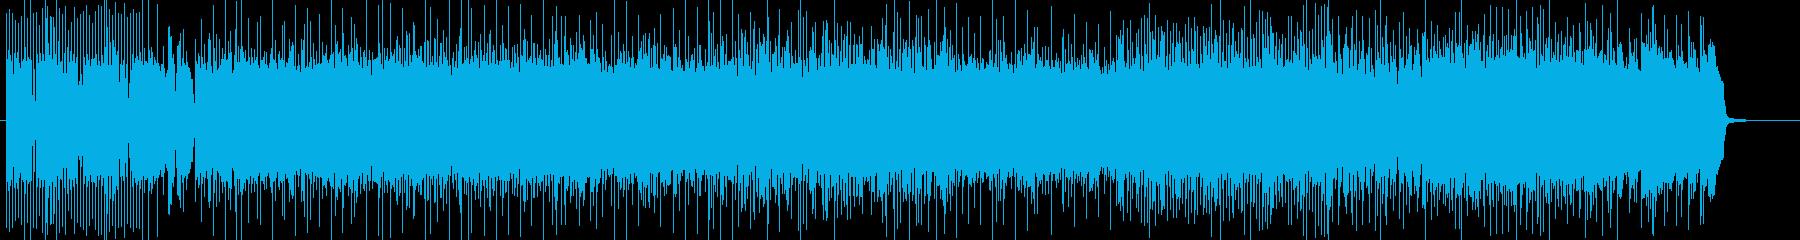 「HR/HM」「DARK」BGM144の再生済みの波形